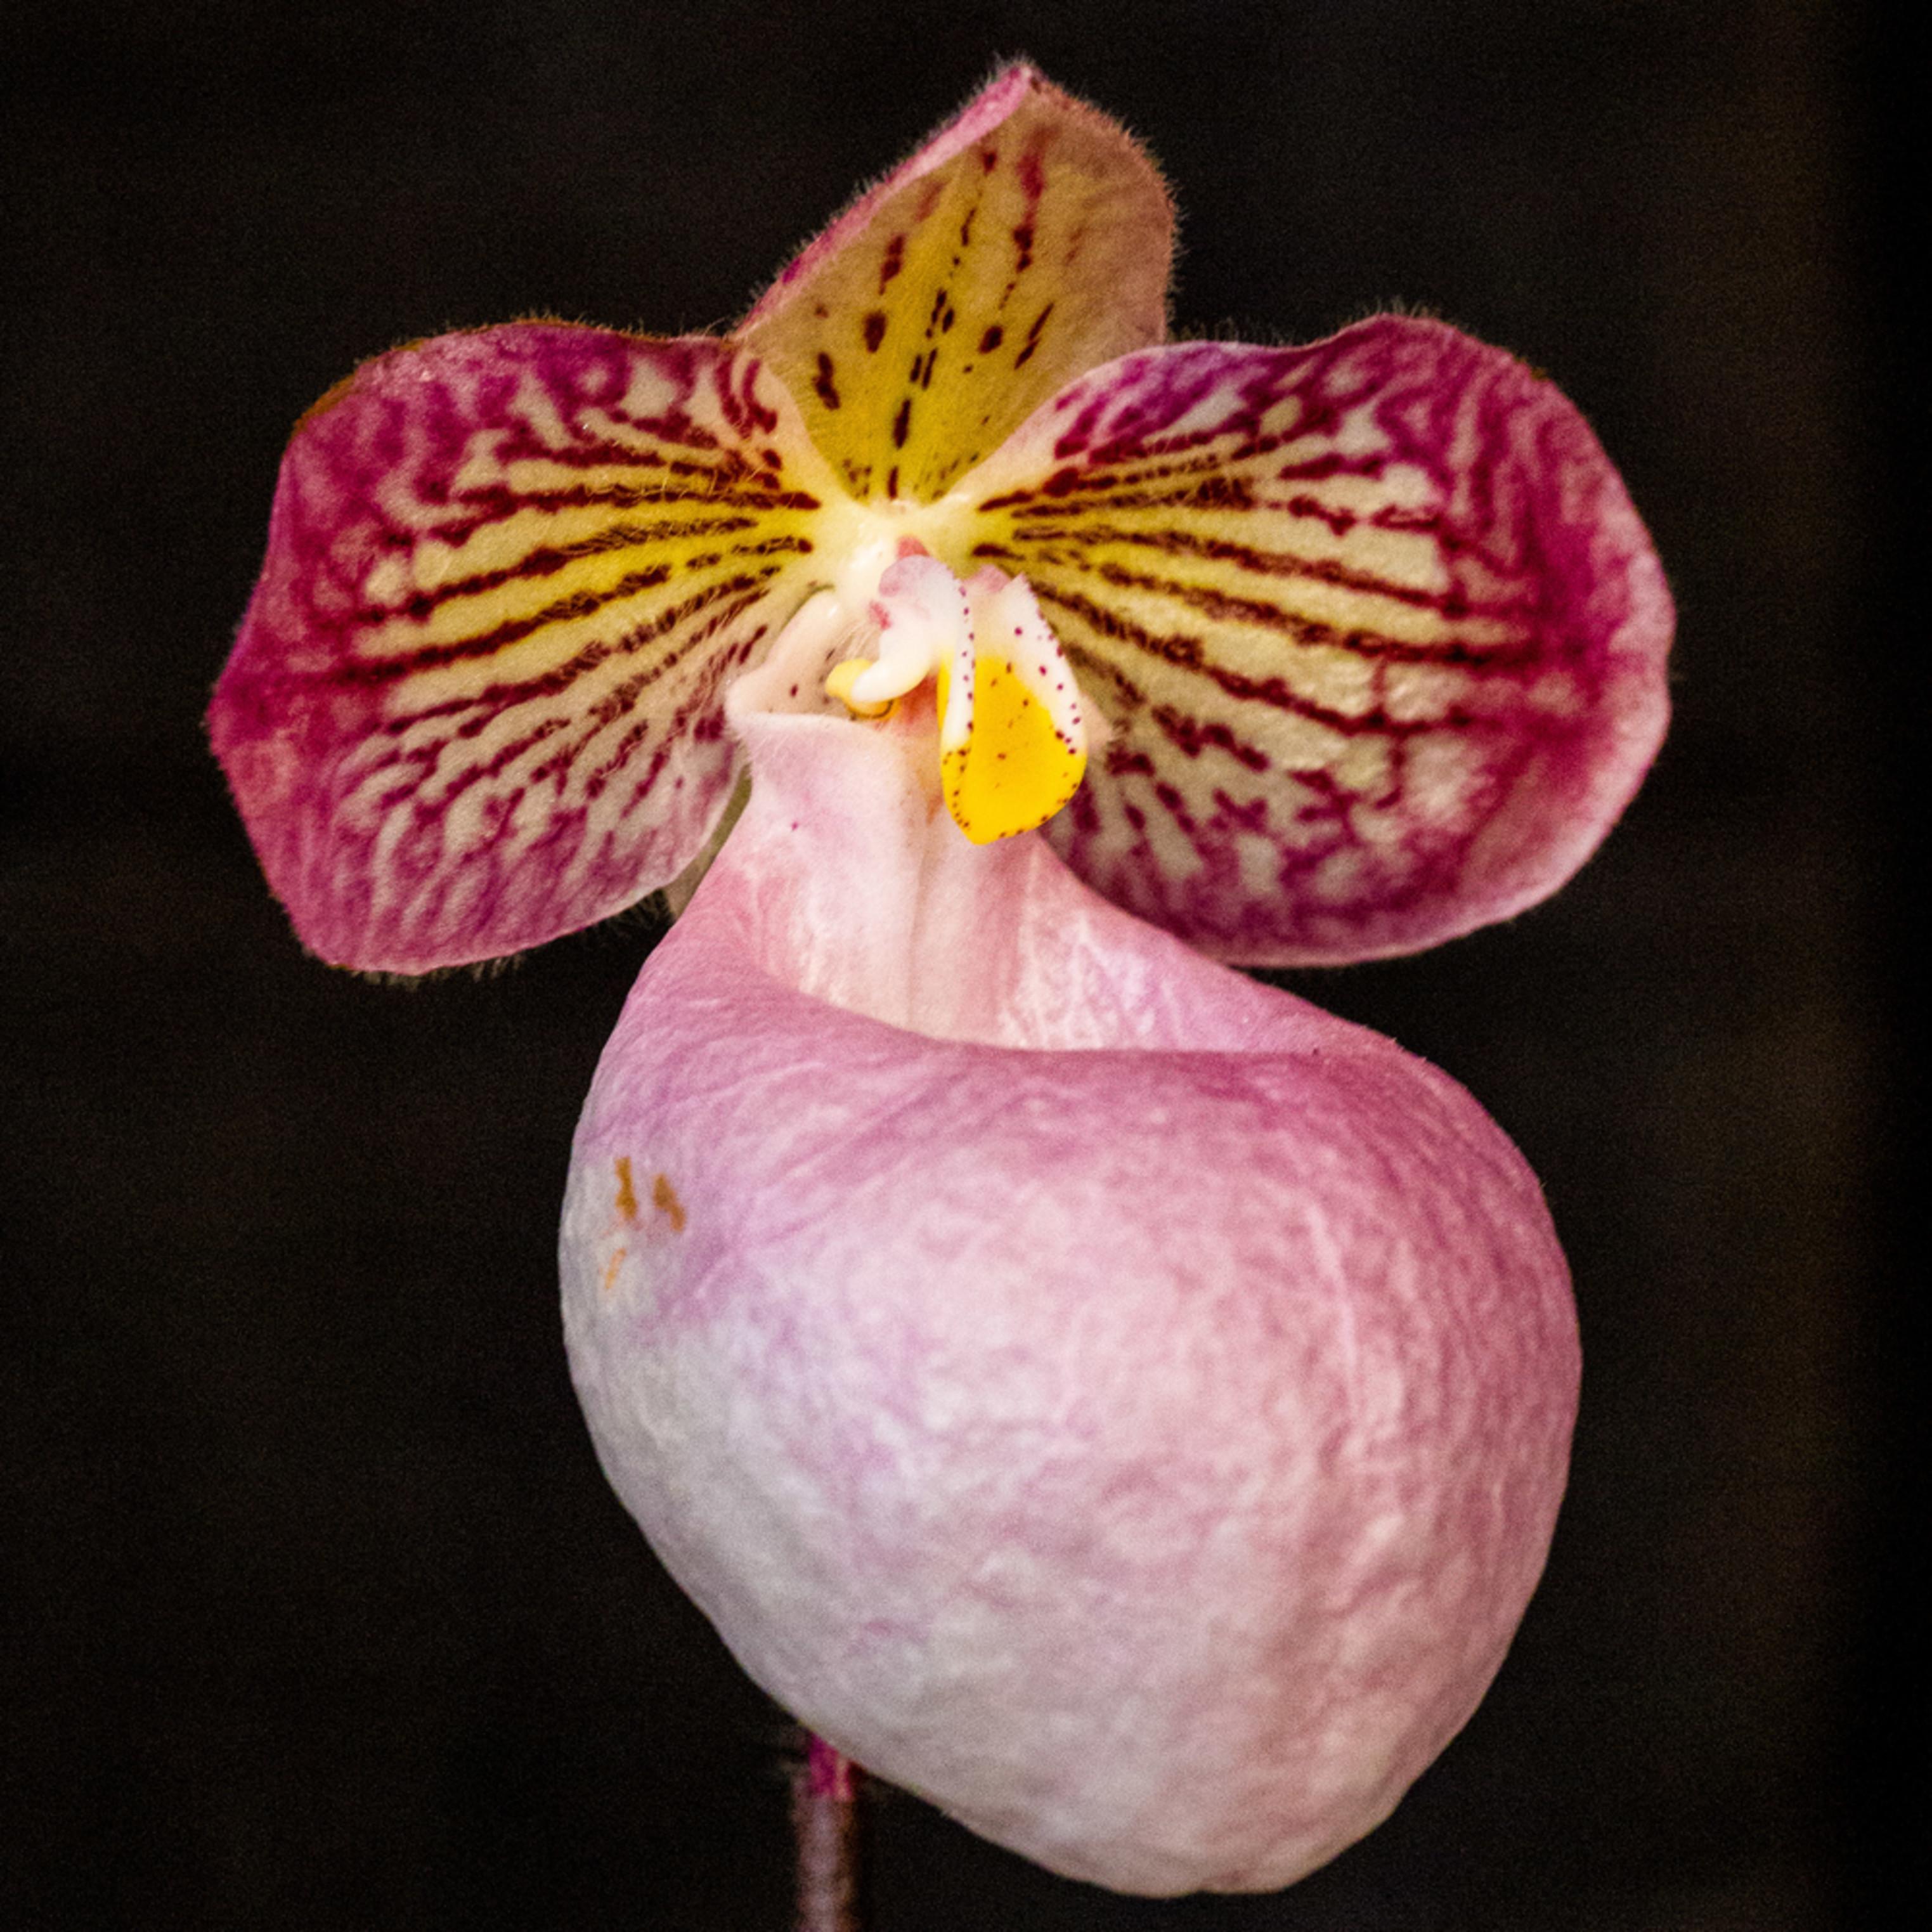 Lady slipper orchid pink hkws5t